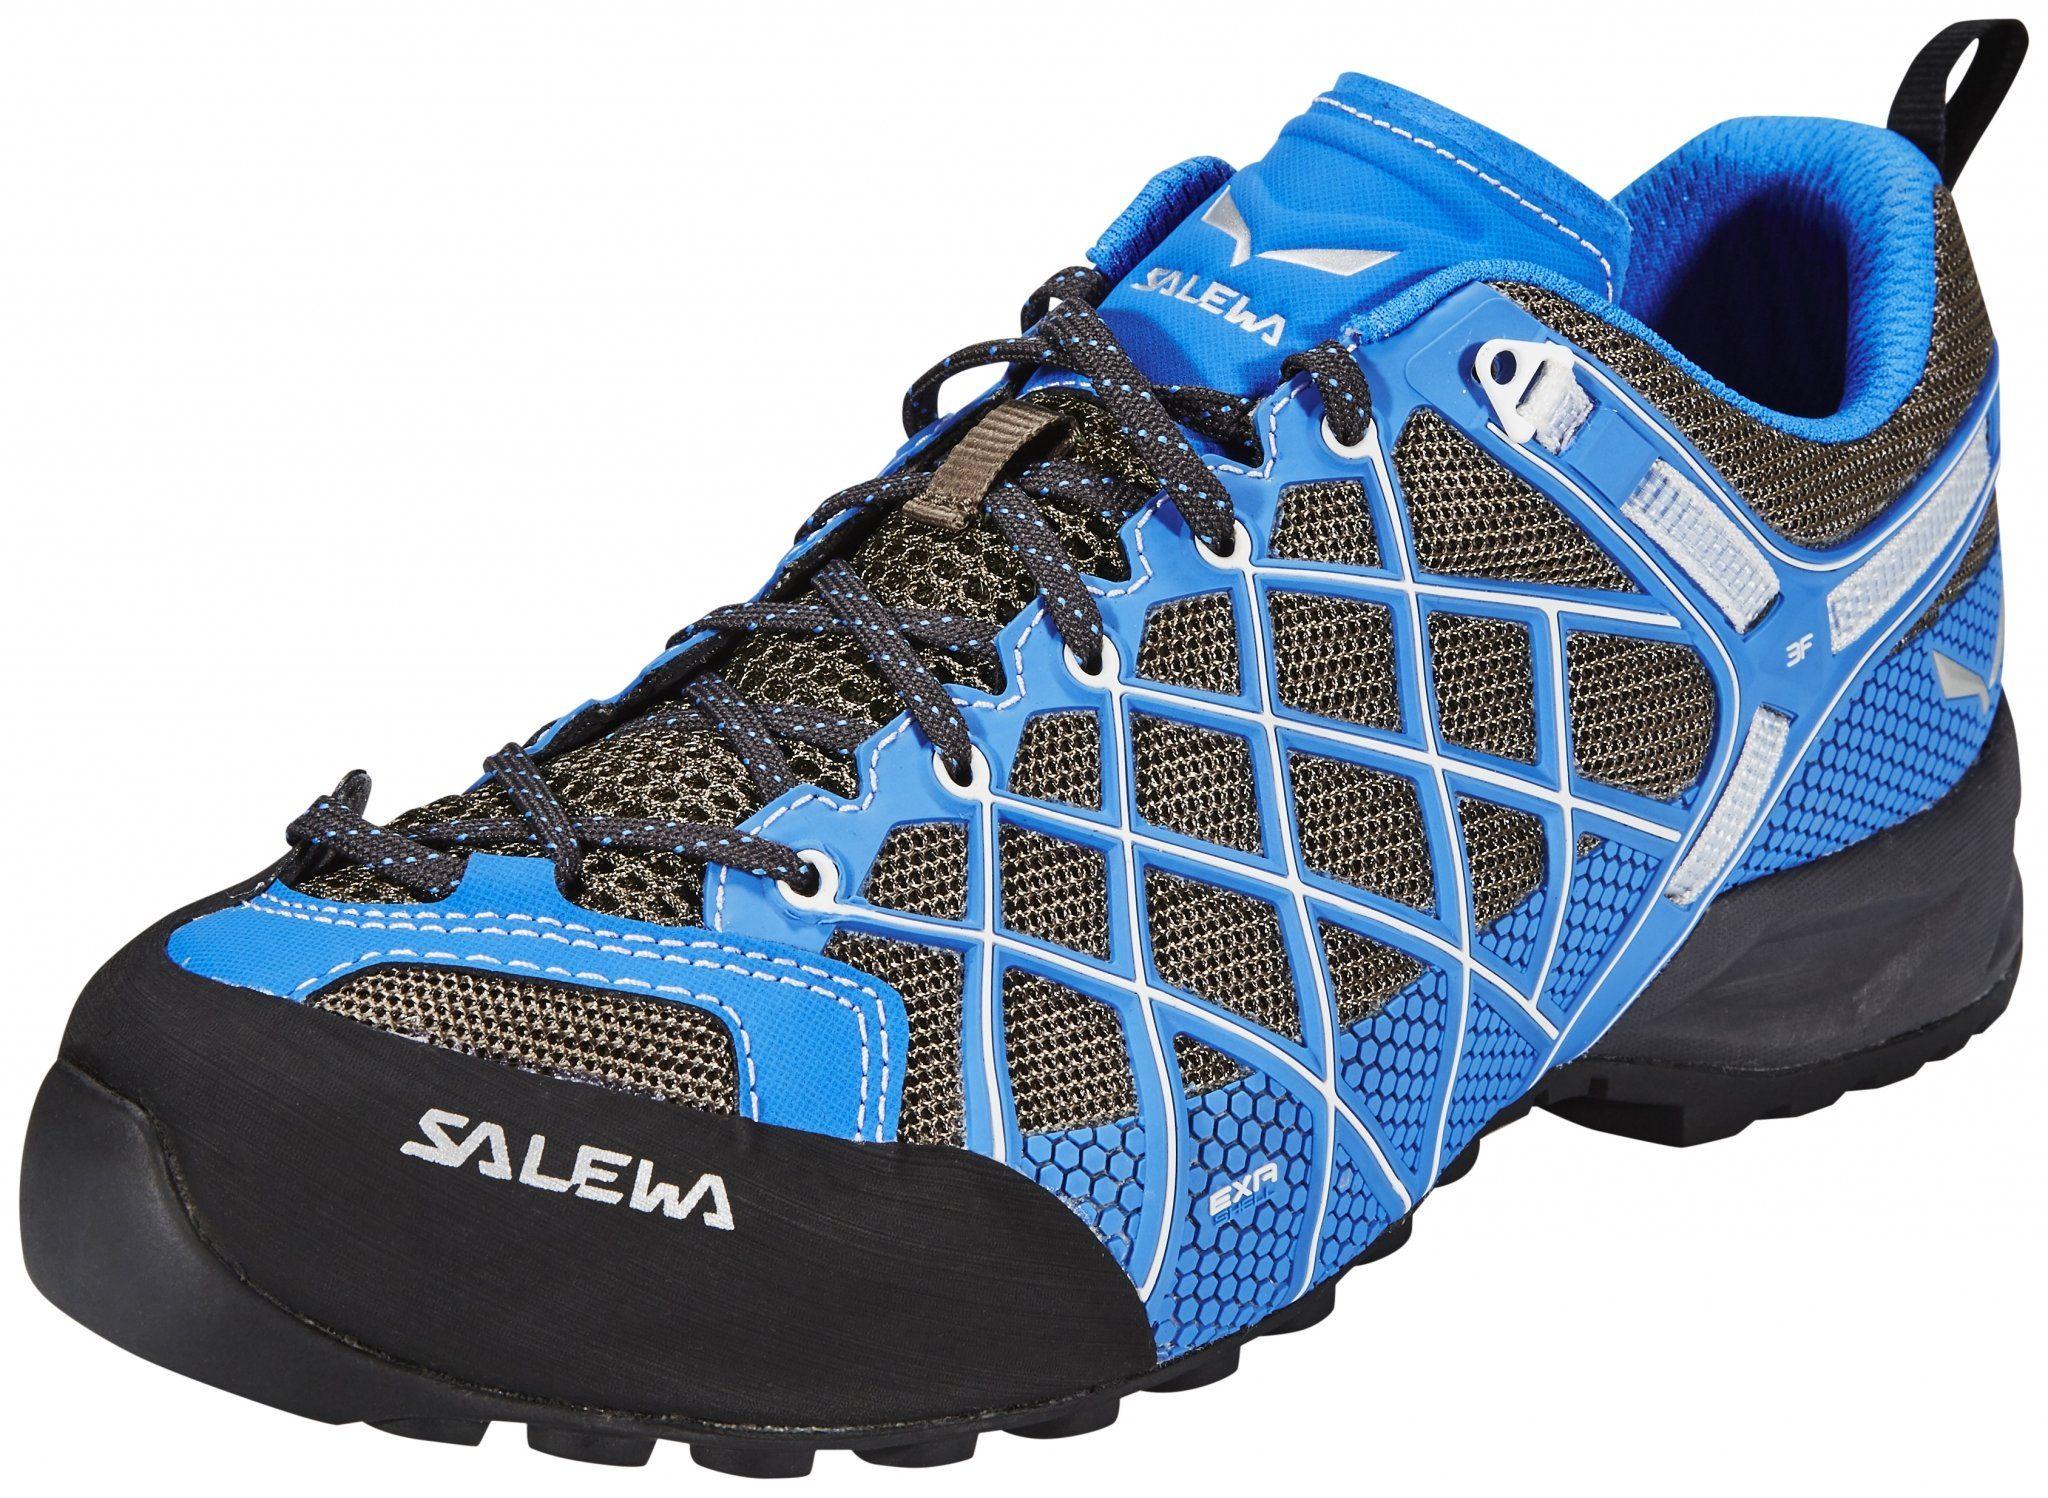 Salewa Kletterschuh »Wildfire Vent Approach Shoes Men«